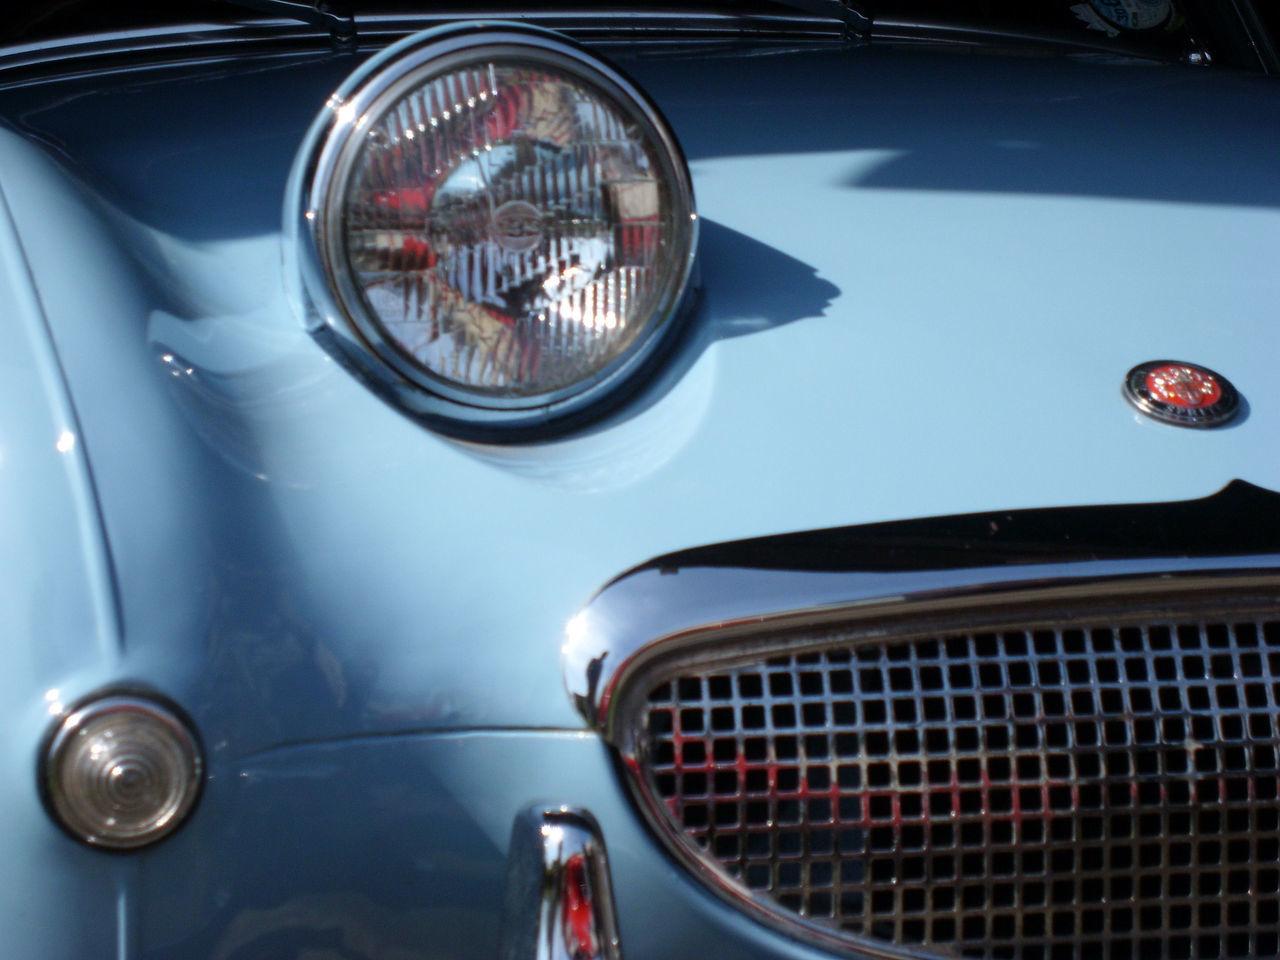 Austin Healey Blue Car Blue Sports Car Bonnet Chrome Chrome Grill Frog Eyed Frogeyed Sprite Headlight Radiator Grill Sky Blue Sprite Vintage Car Vintage Sports Car 1960's Blue Wave